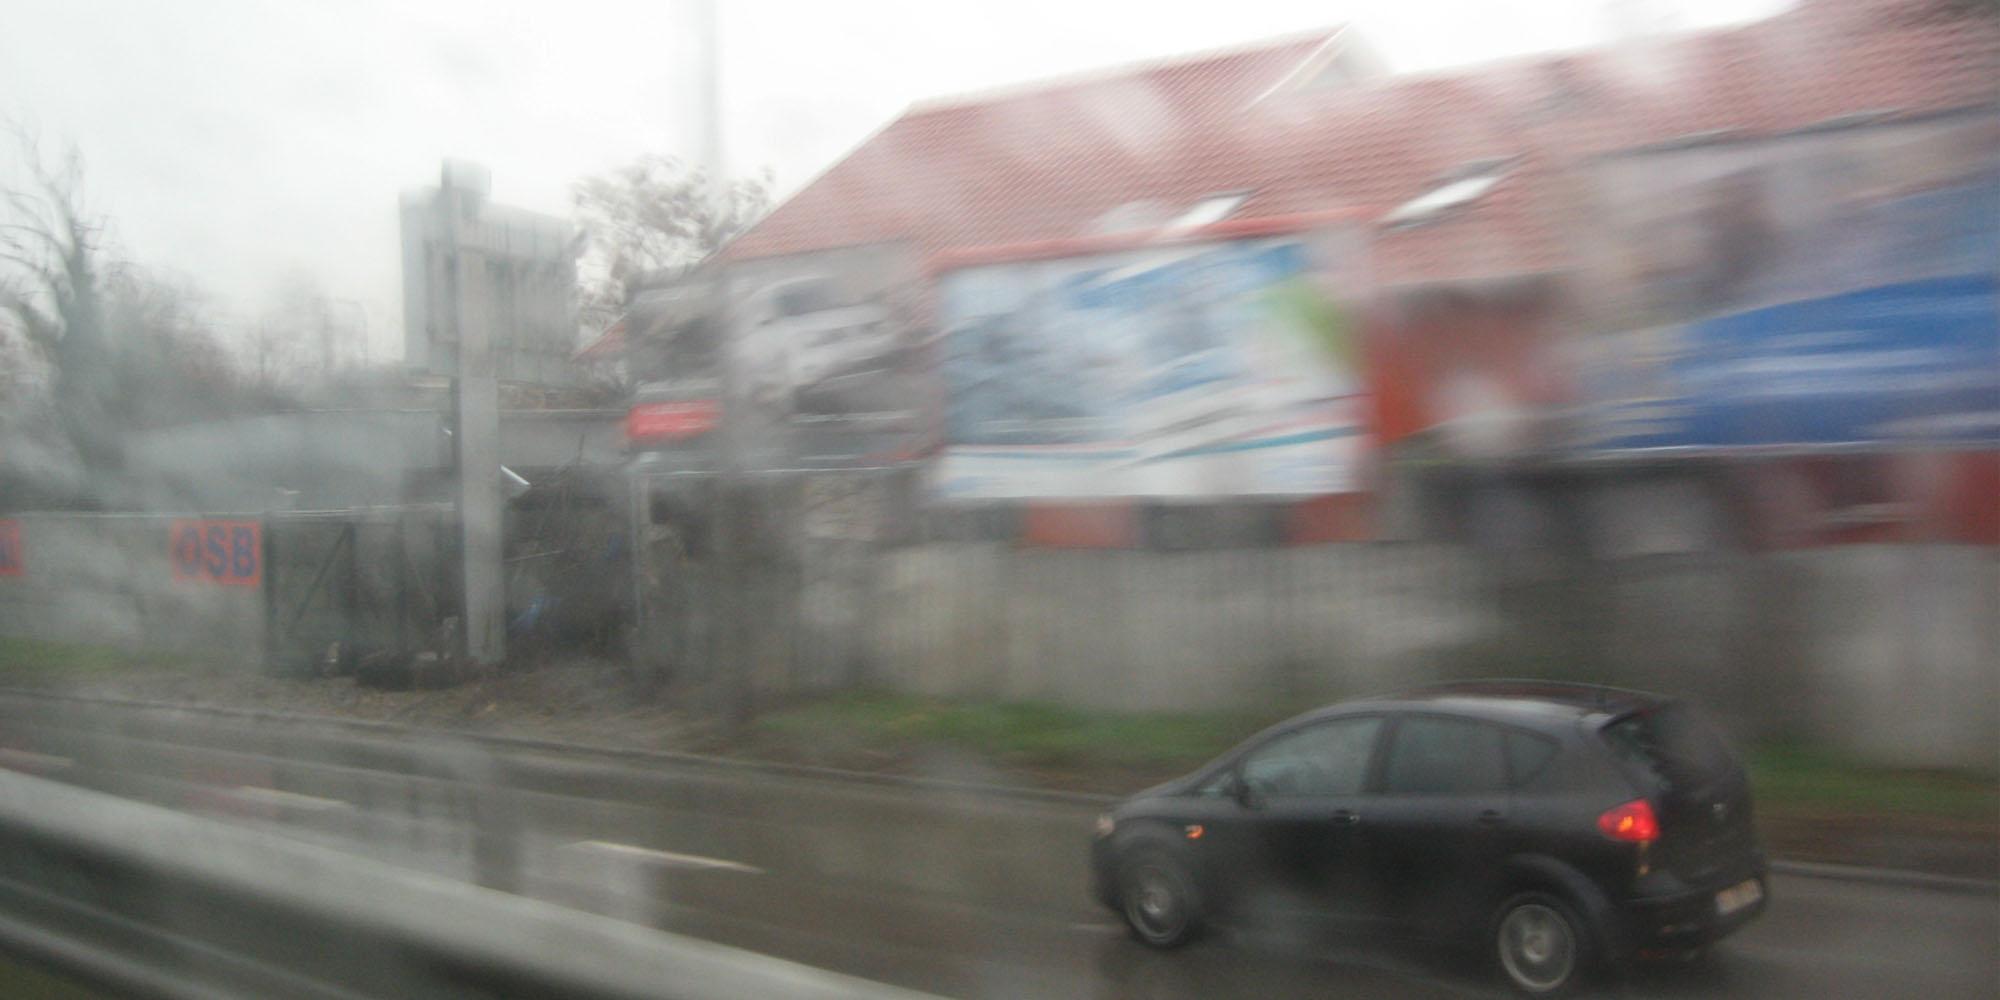 budapest-4-12-08.jpg